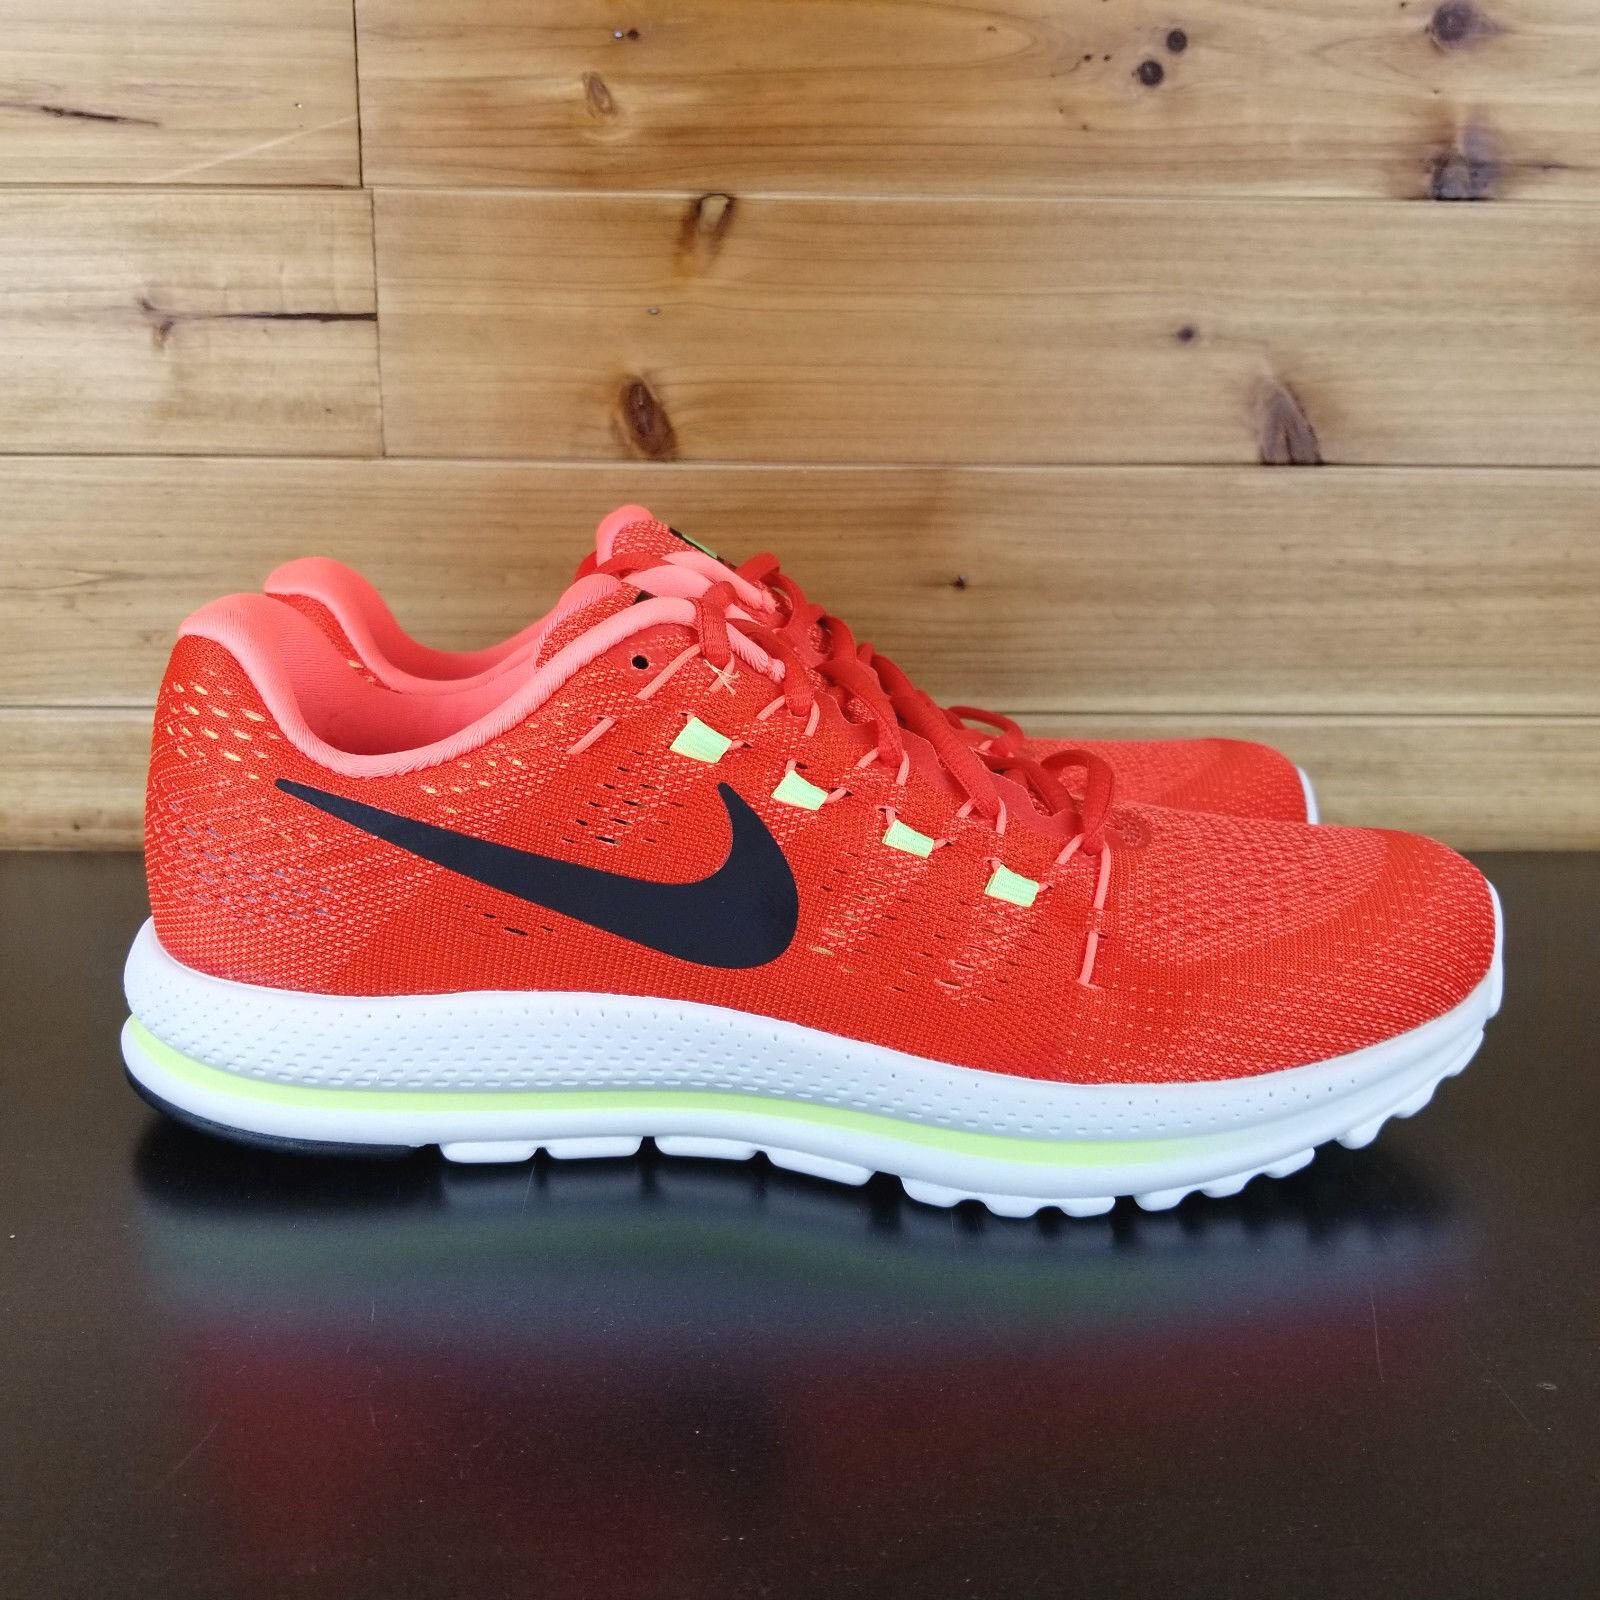 Nike air scarpa zoom vomero 12 a scarpa air arancione Uomo dimensioni 10,5 / 863762-800 f6157c